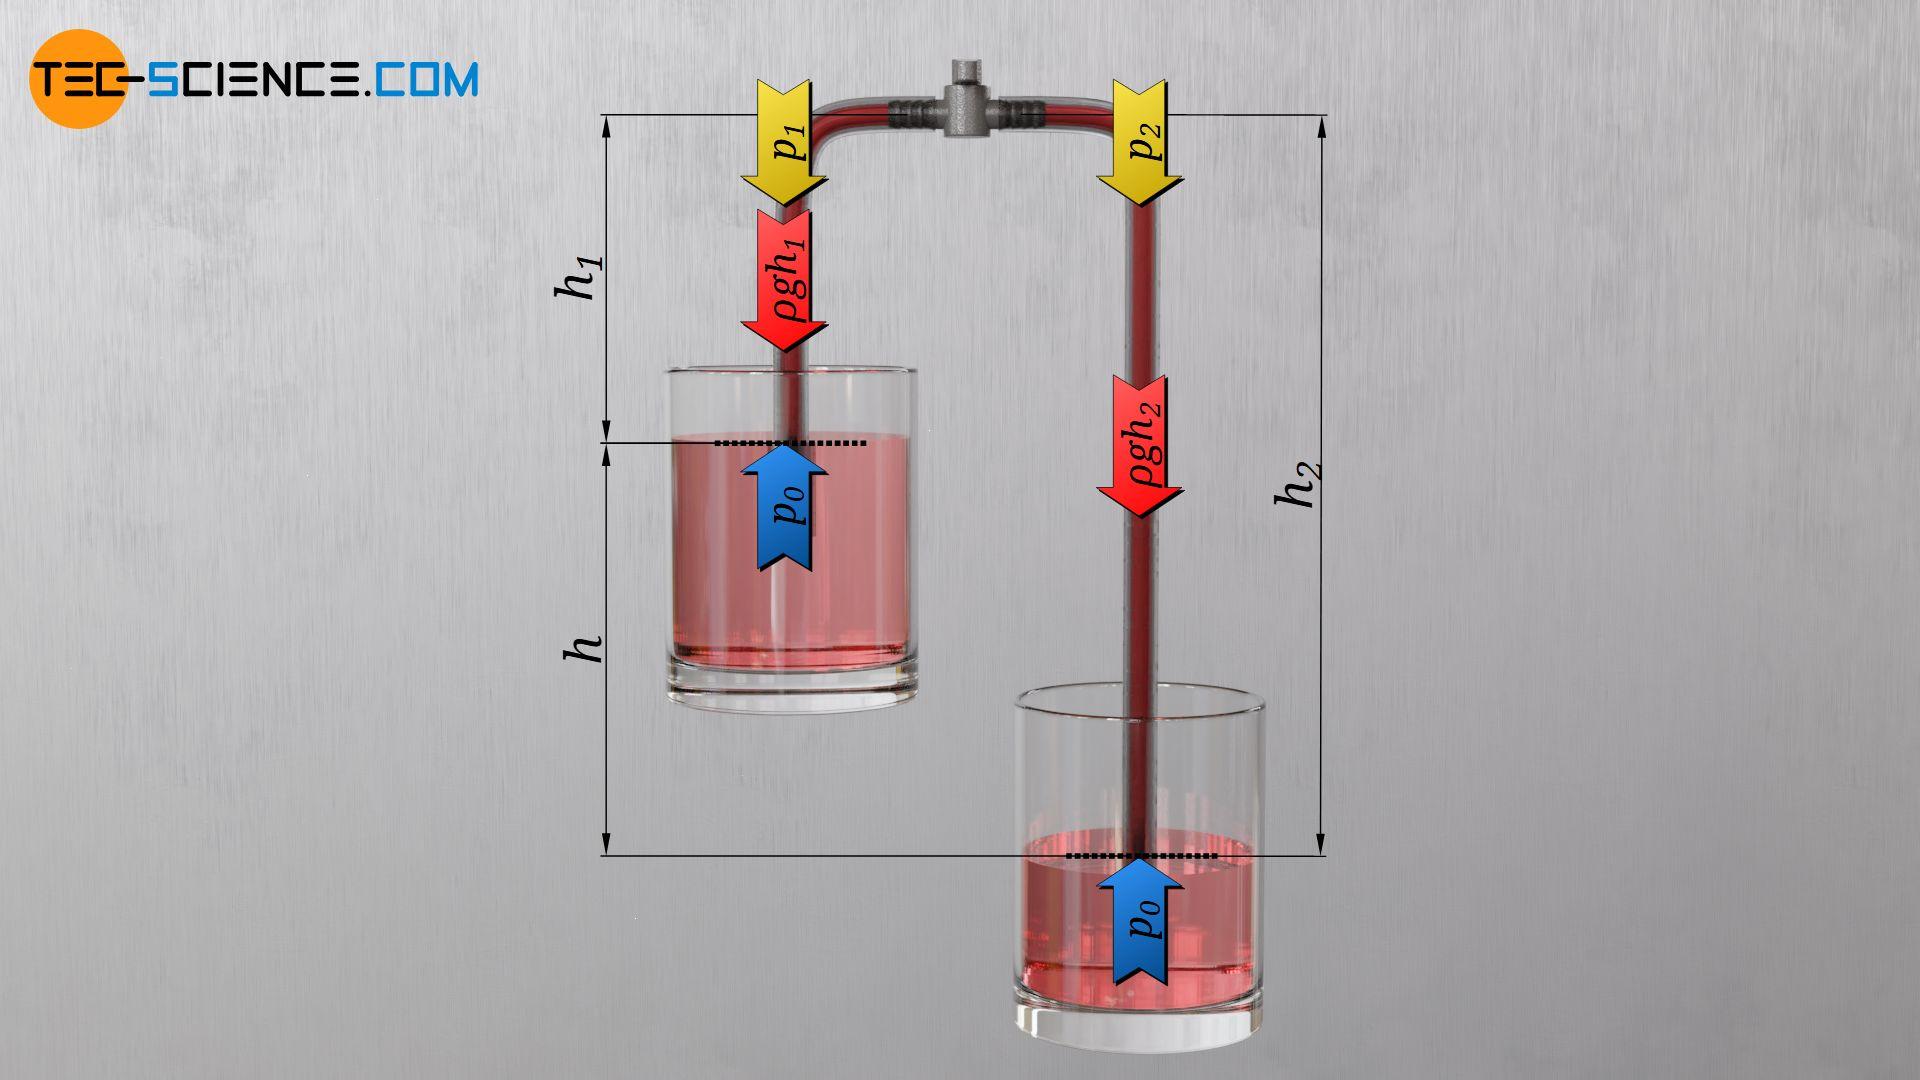 Pressures in the flexible tube